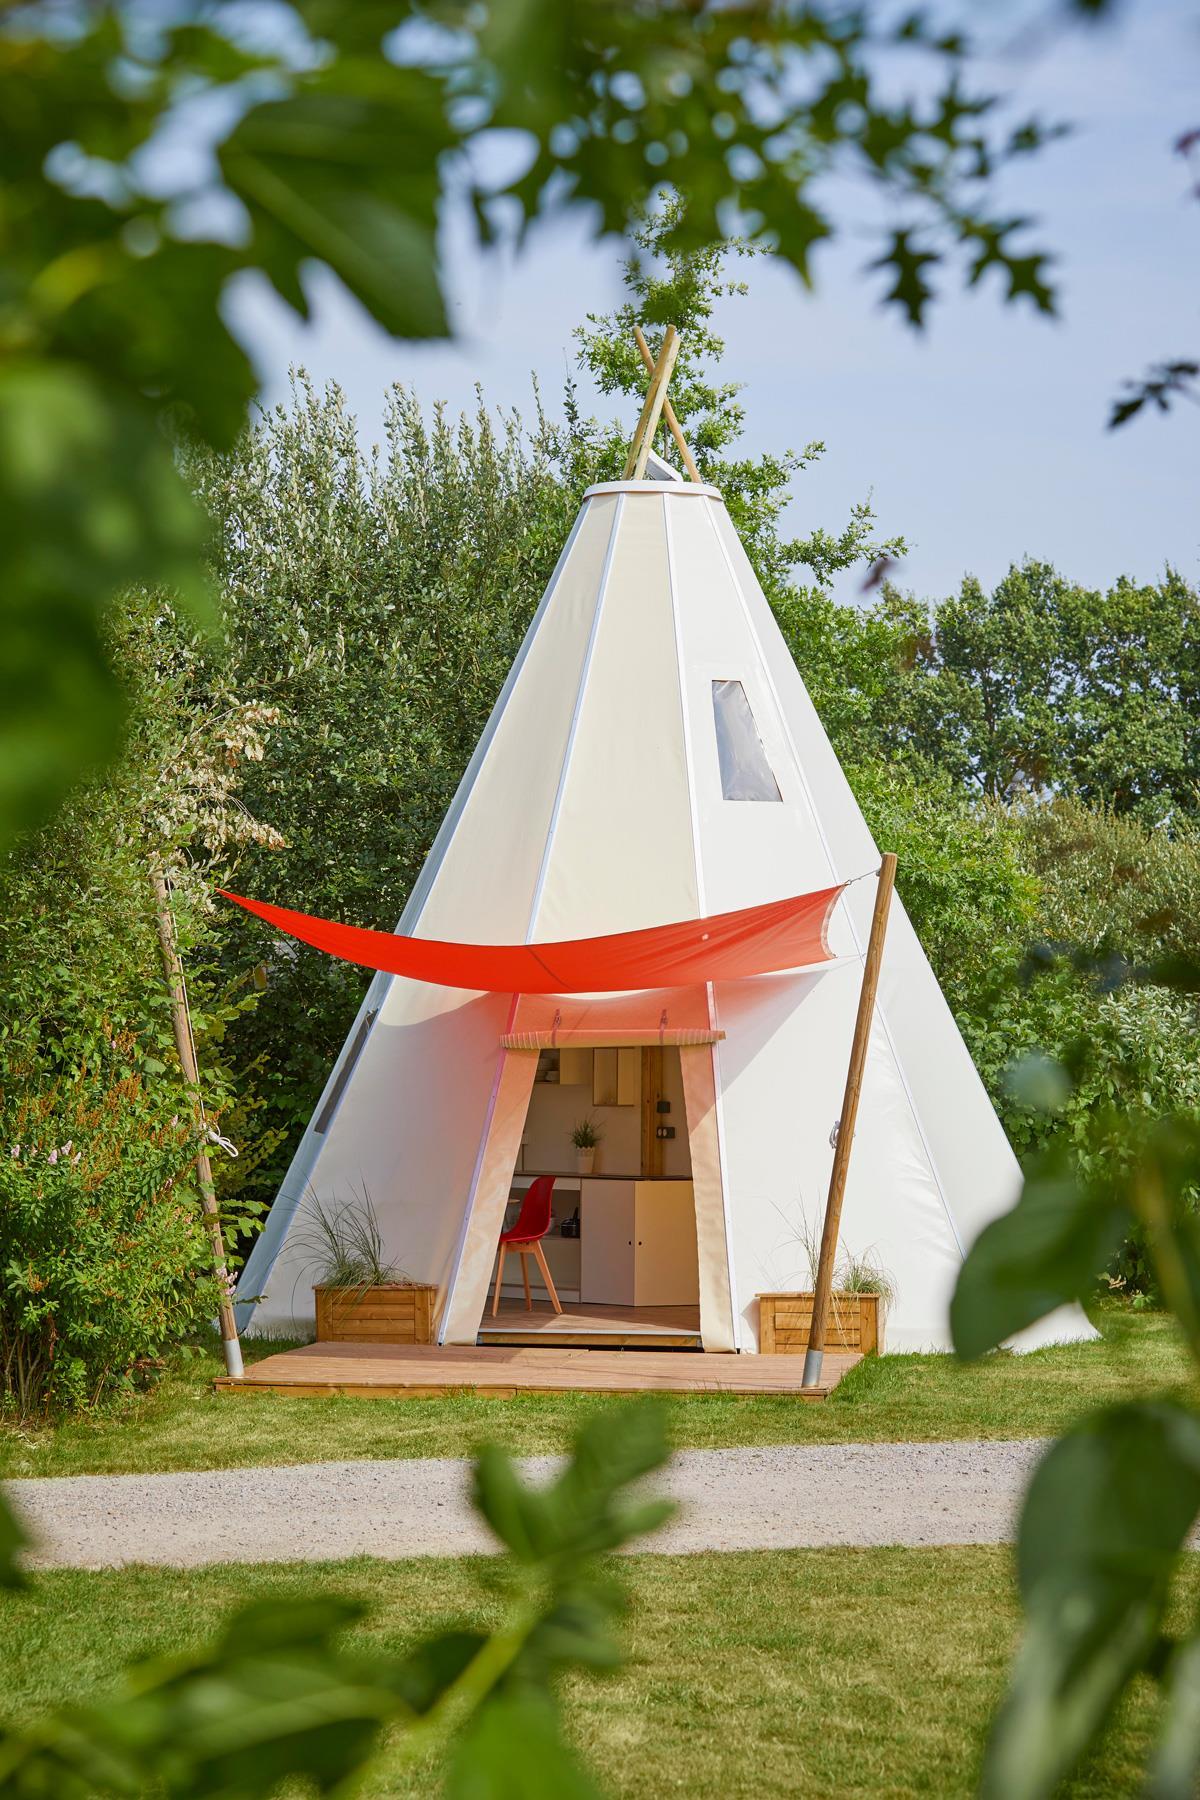 Location - Confort Tipihome 34 M² (Rdc 24 M² + Étage 10 M²) + Terrasse - Sans Sanitaire - 2019 - Flower Camping Verte Vallee